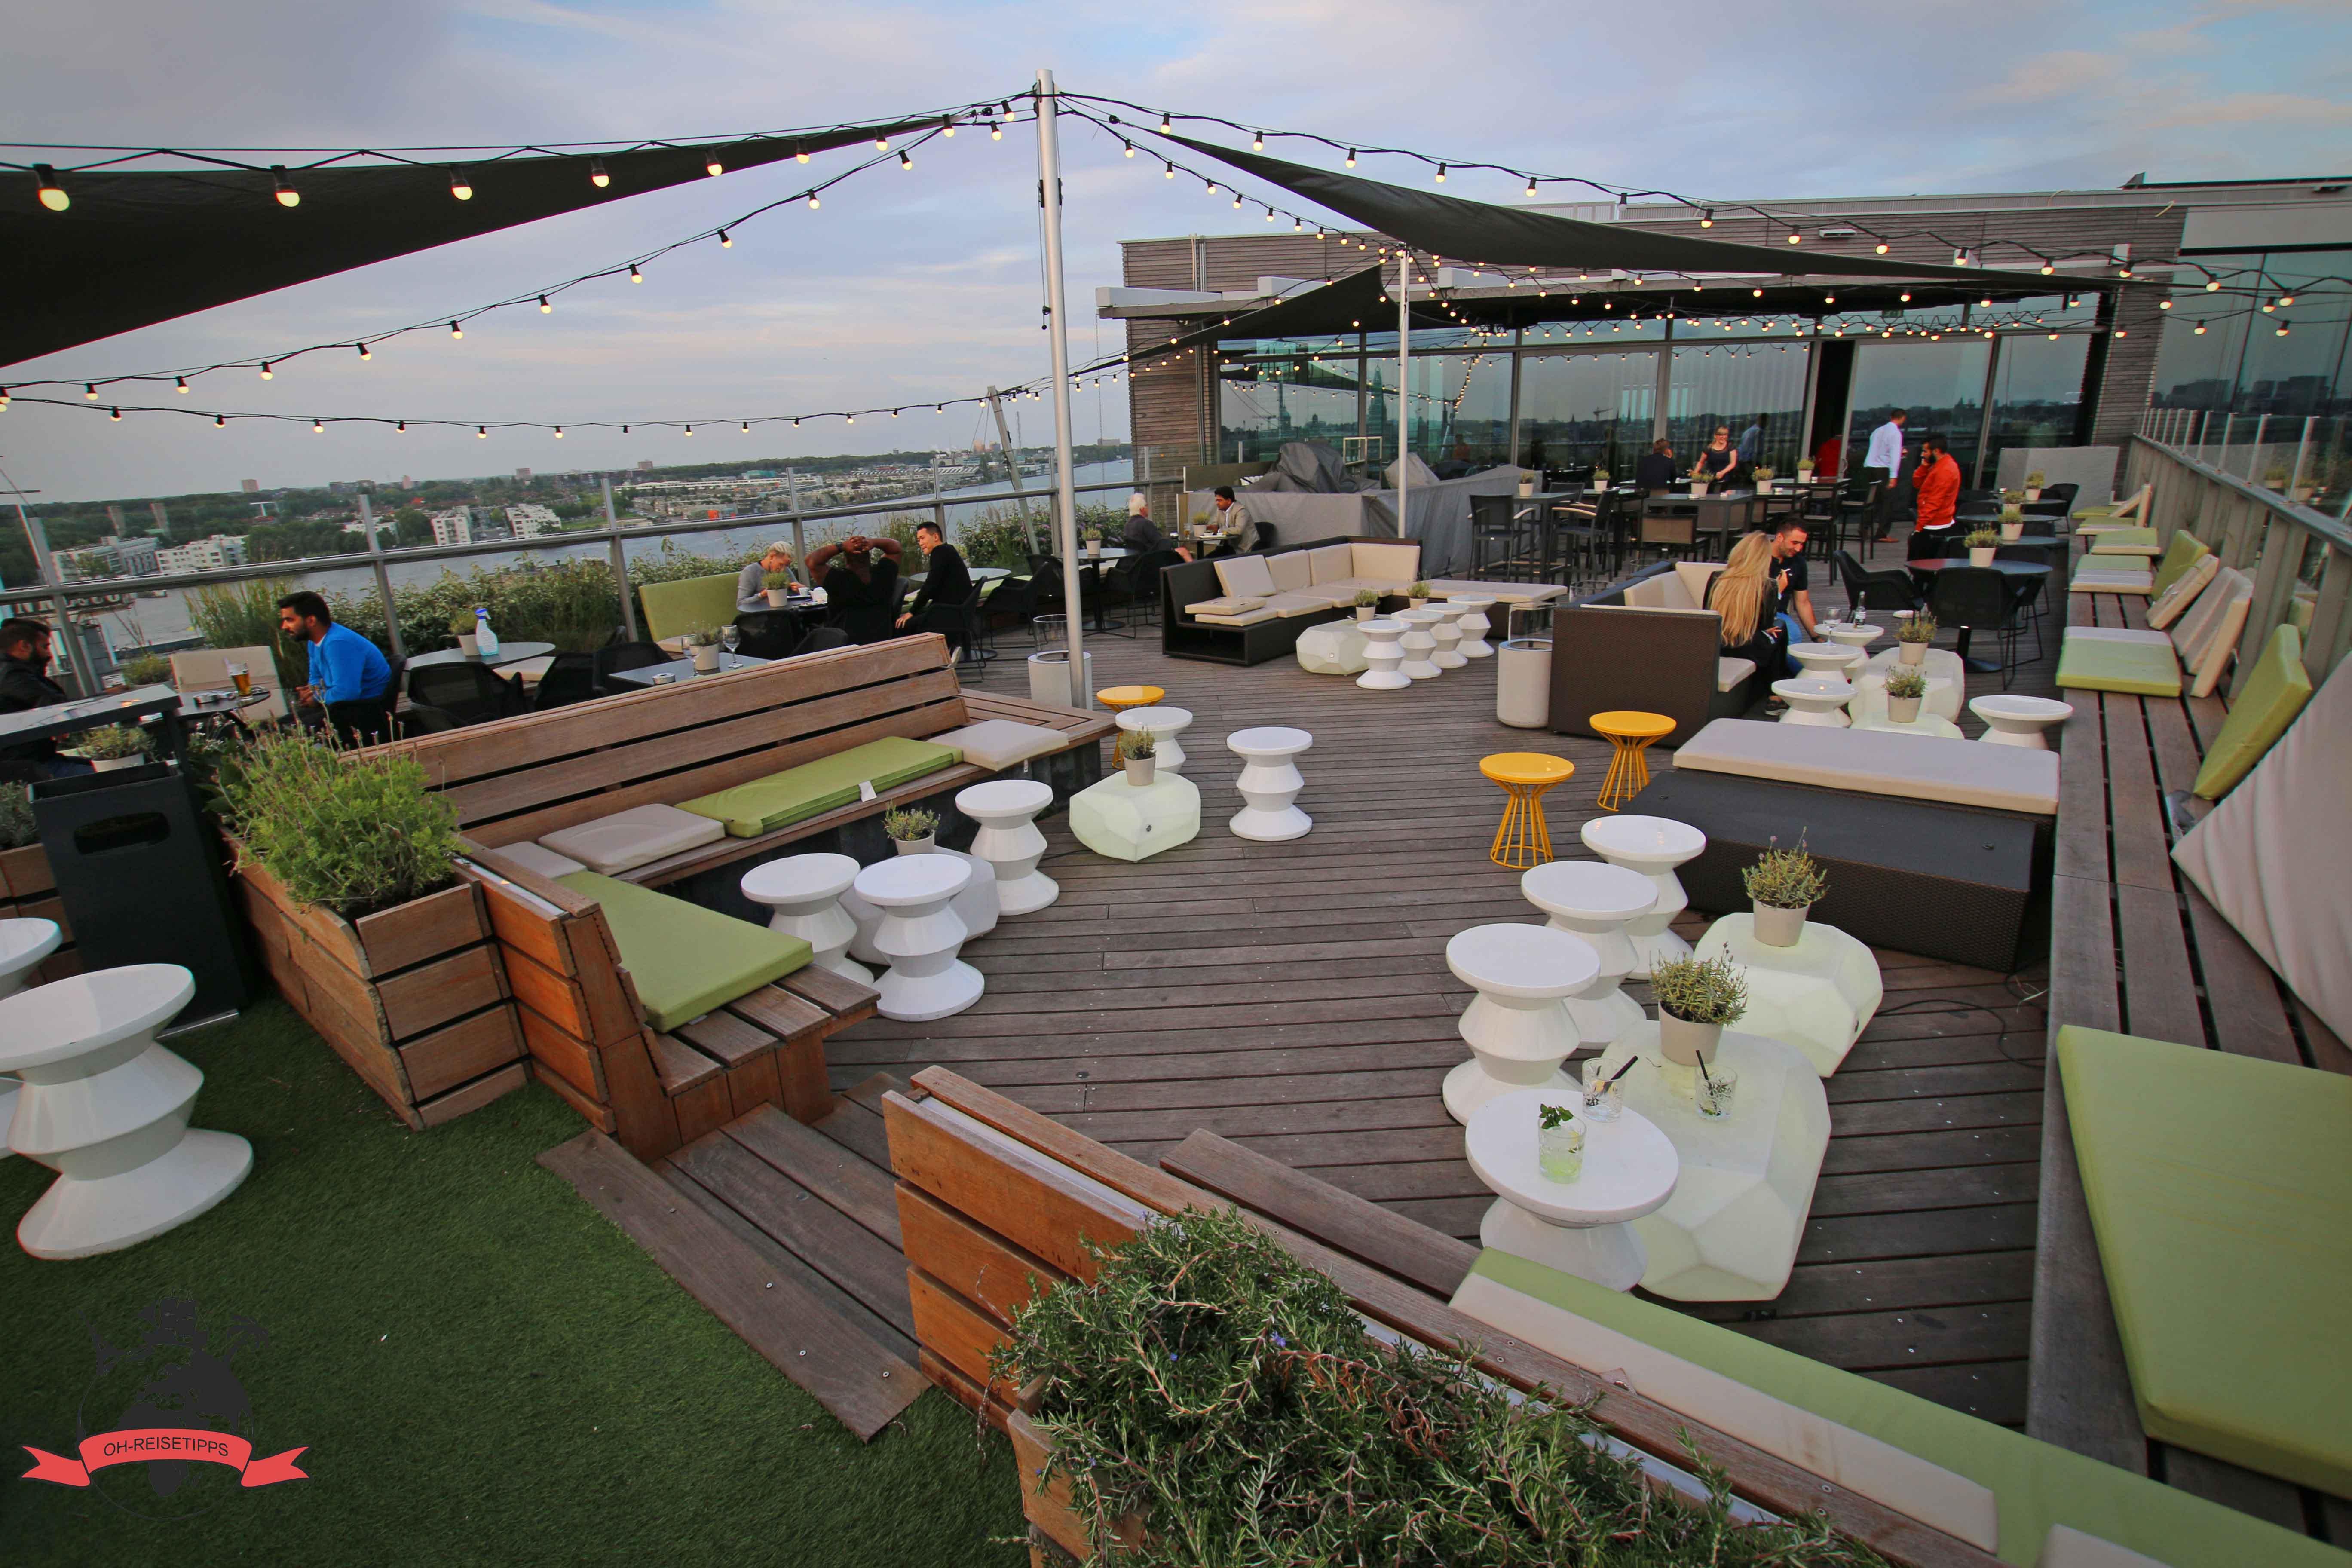 niederlande amsterdam hiltonhotel dachterrasse oh reisetipps. Black Bedroom Furniture Sets. Home Design Ideas